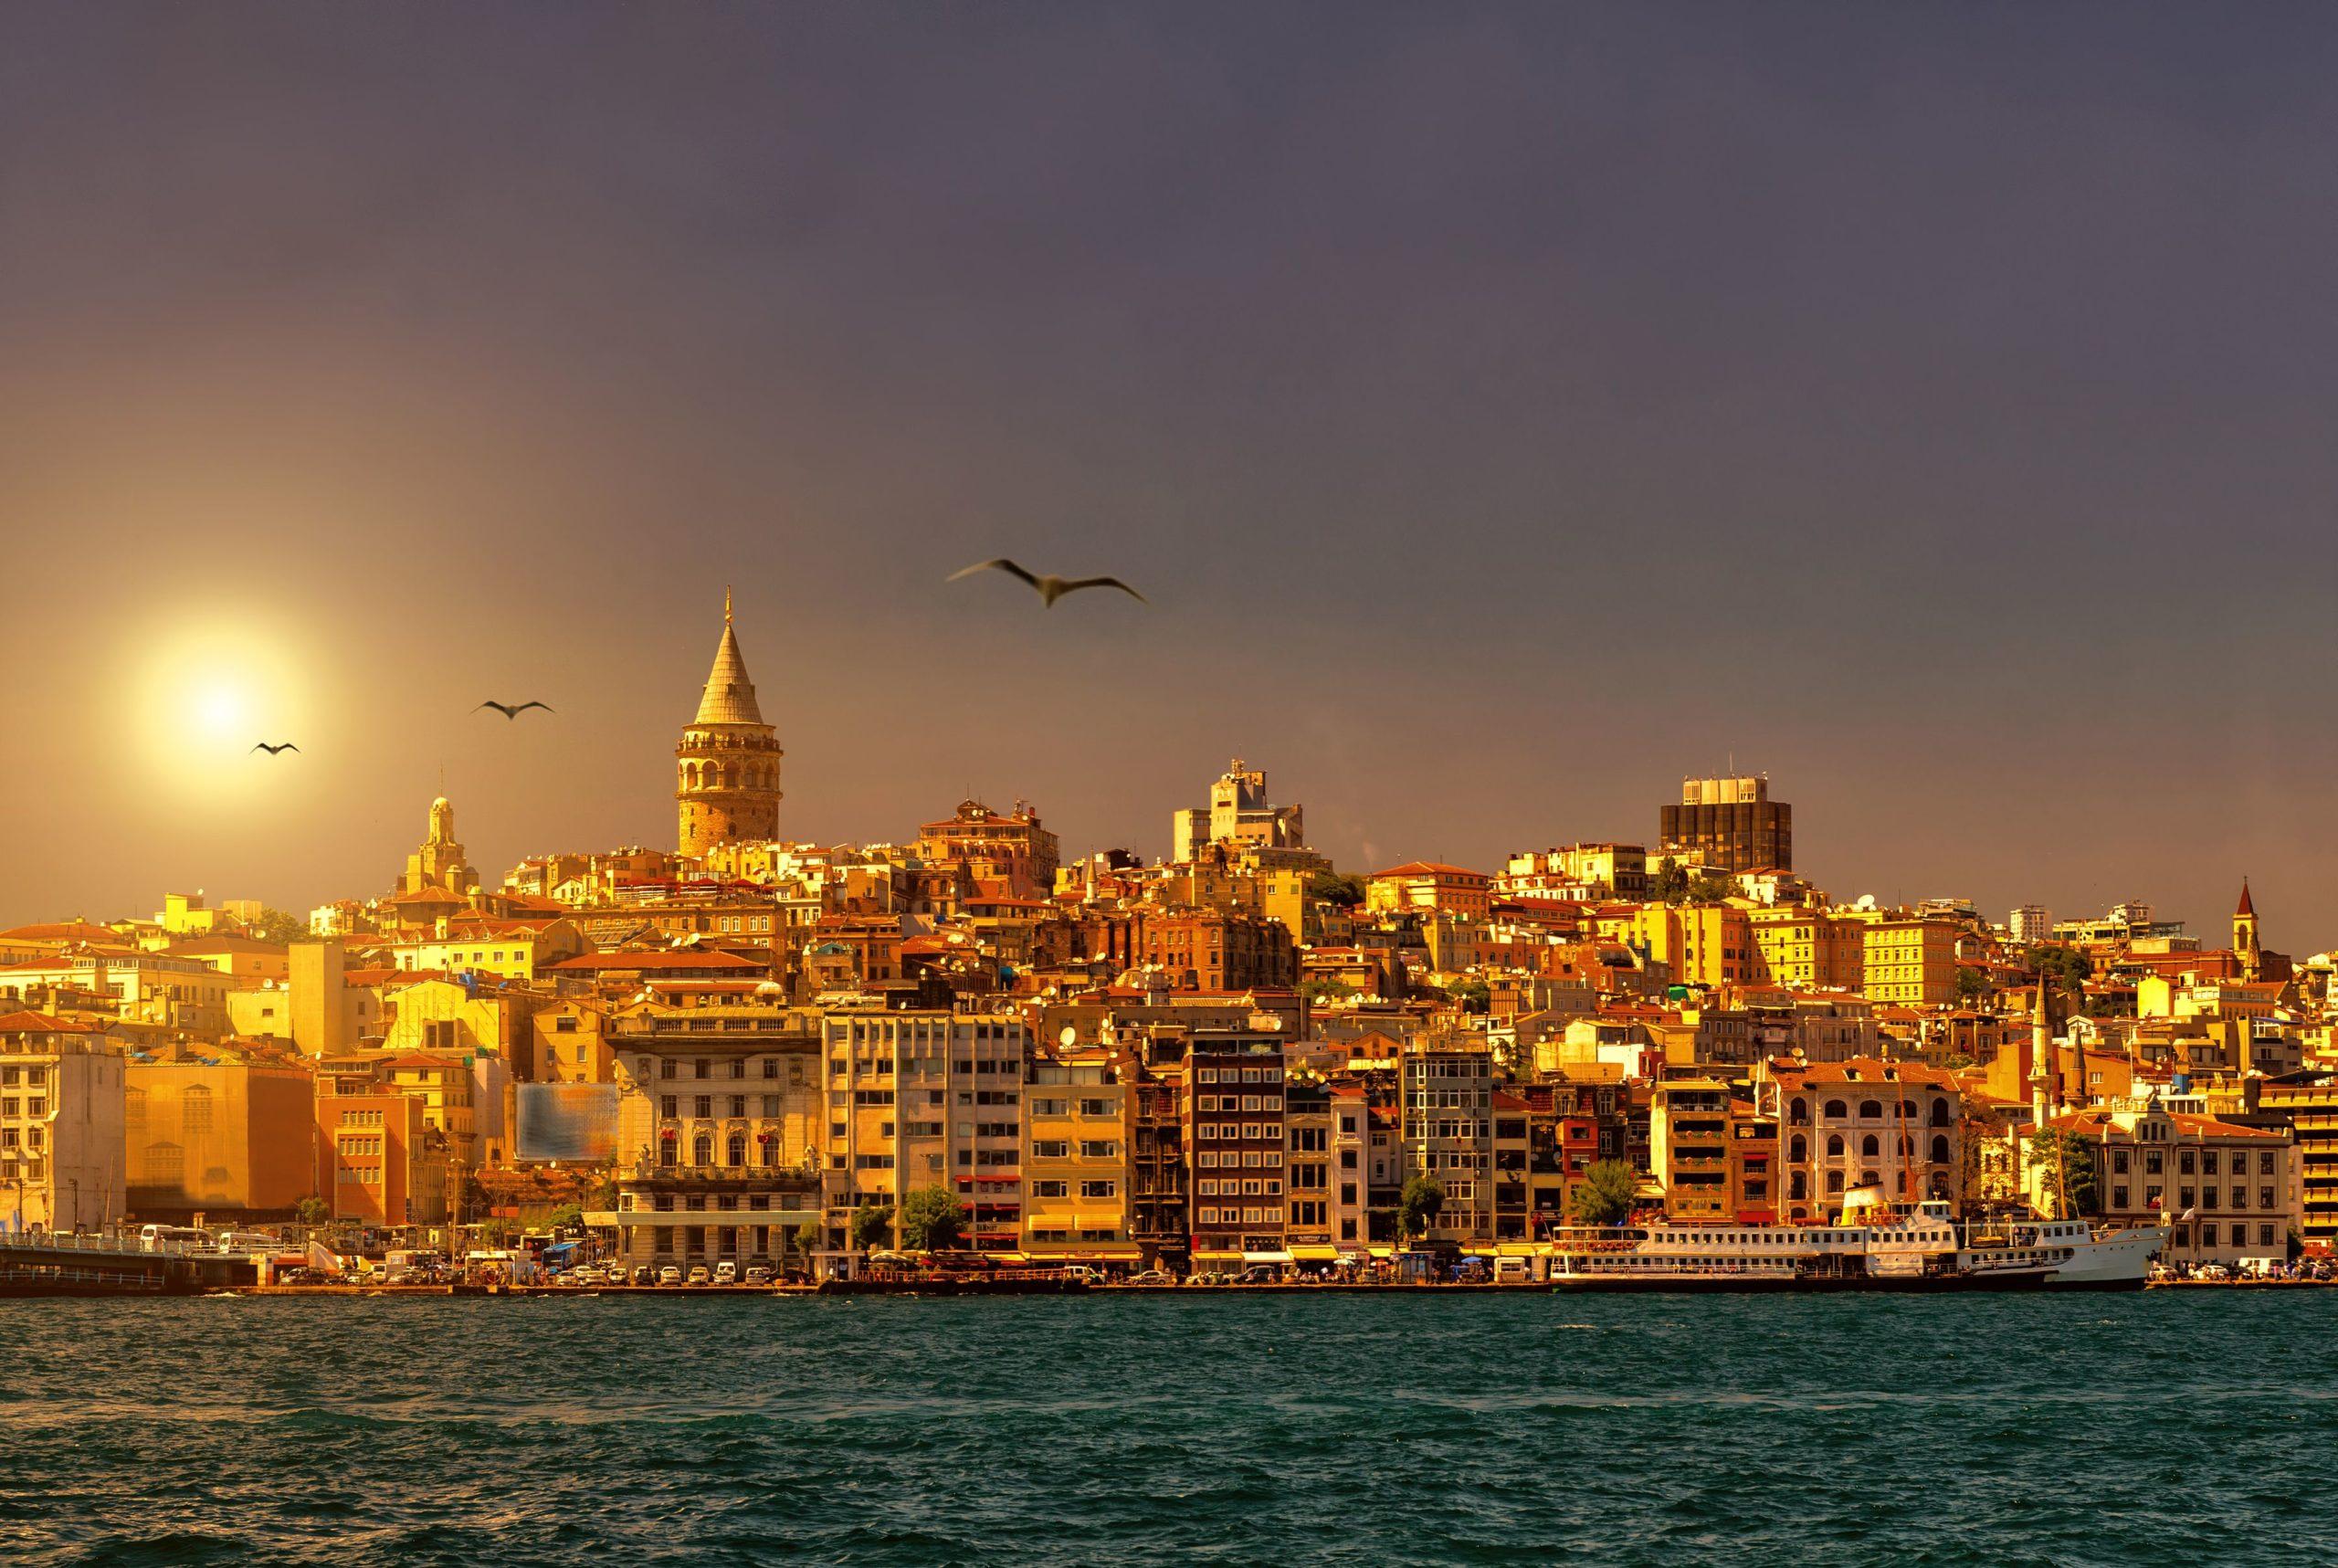 istanbul background photos